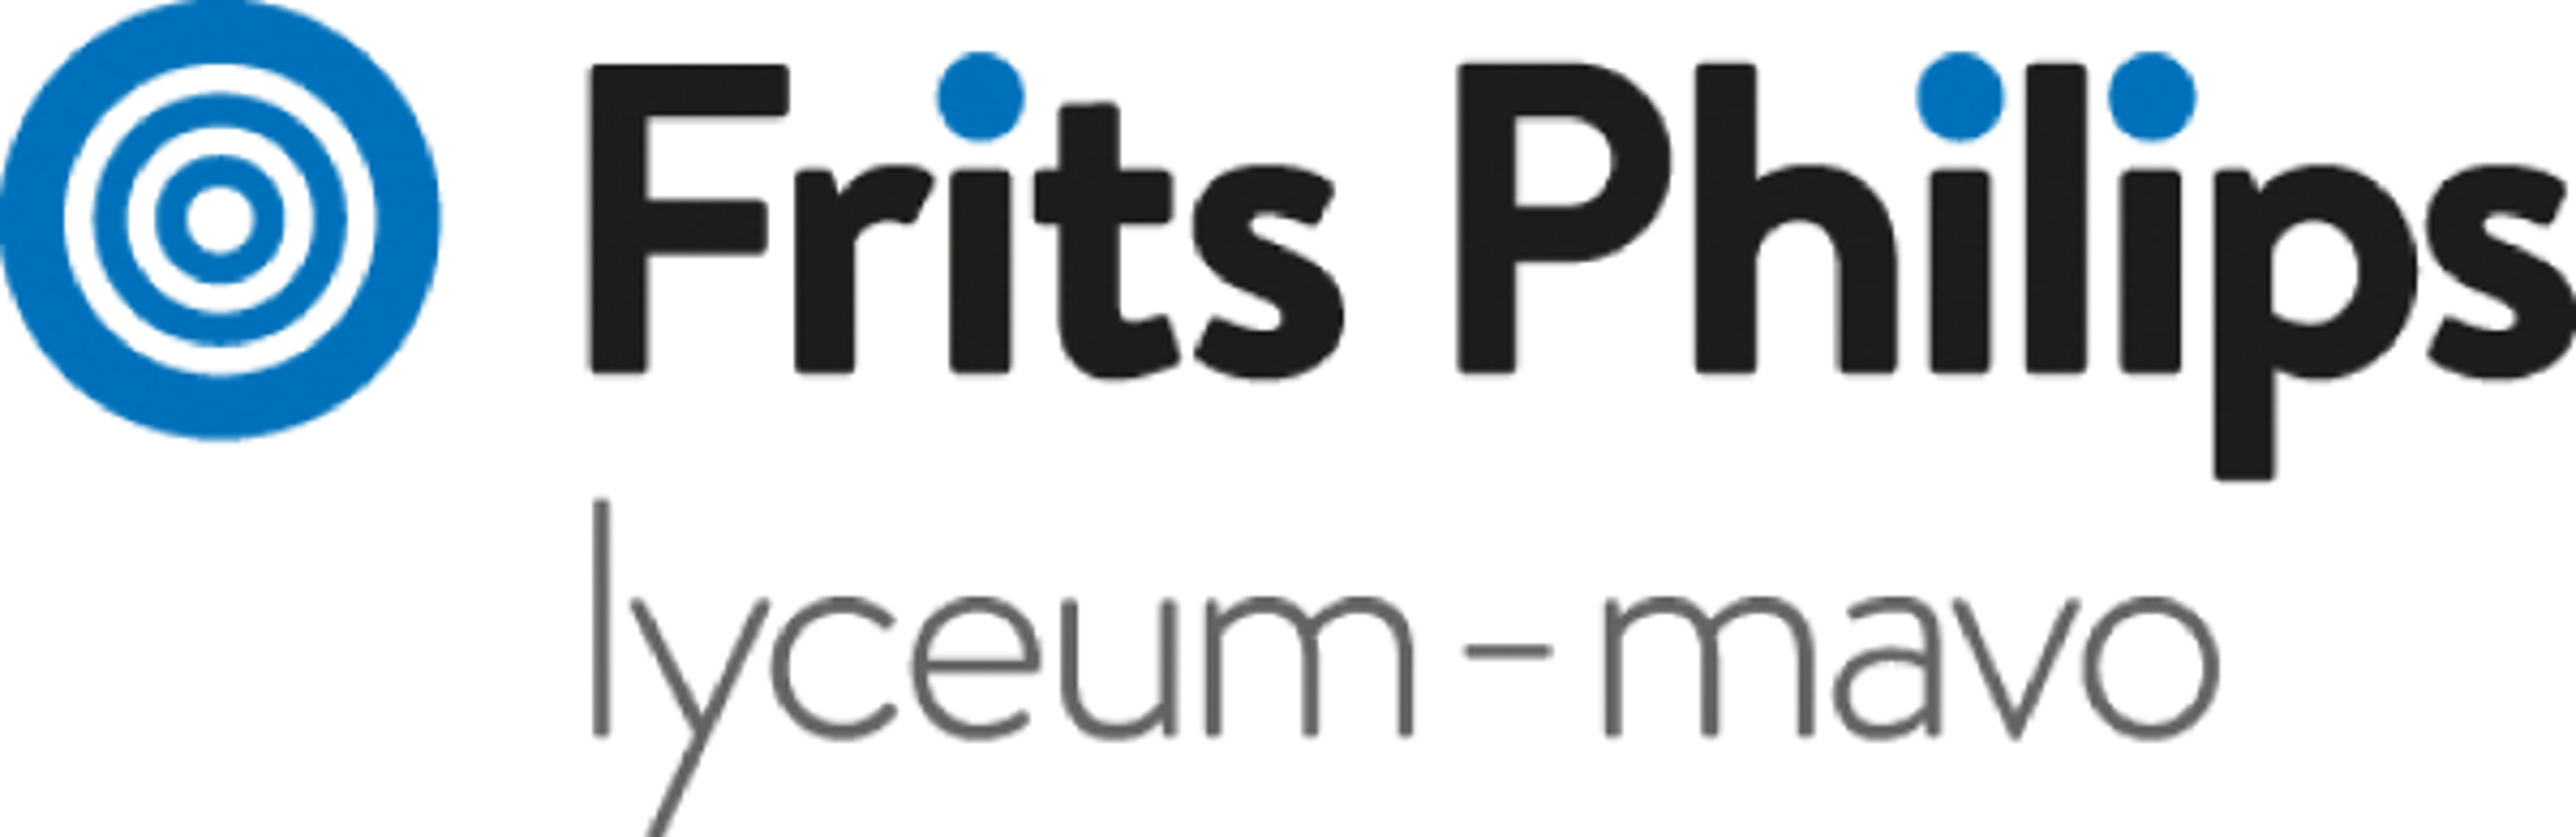 Frits Philips lyceum-mavo logo